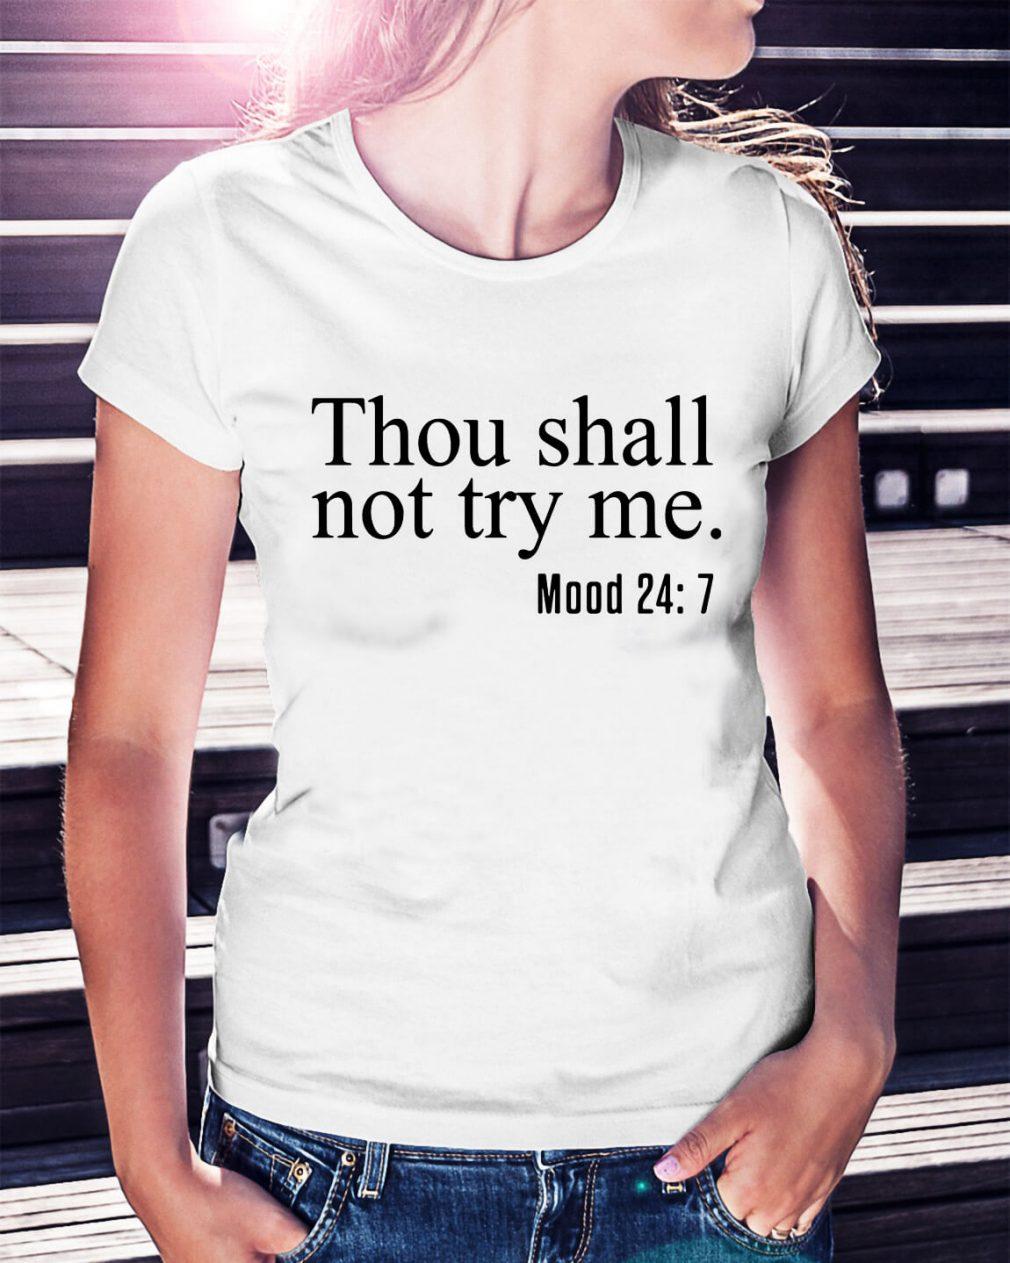 Thou shall not try me mood 24:7 shirt